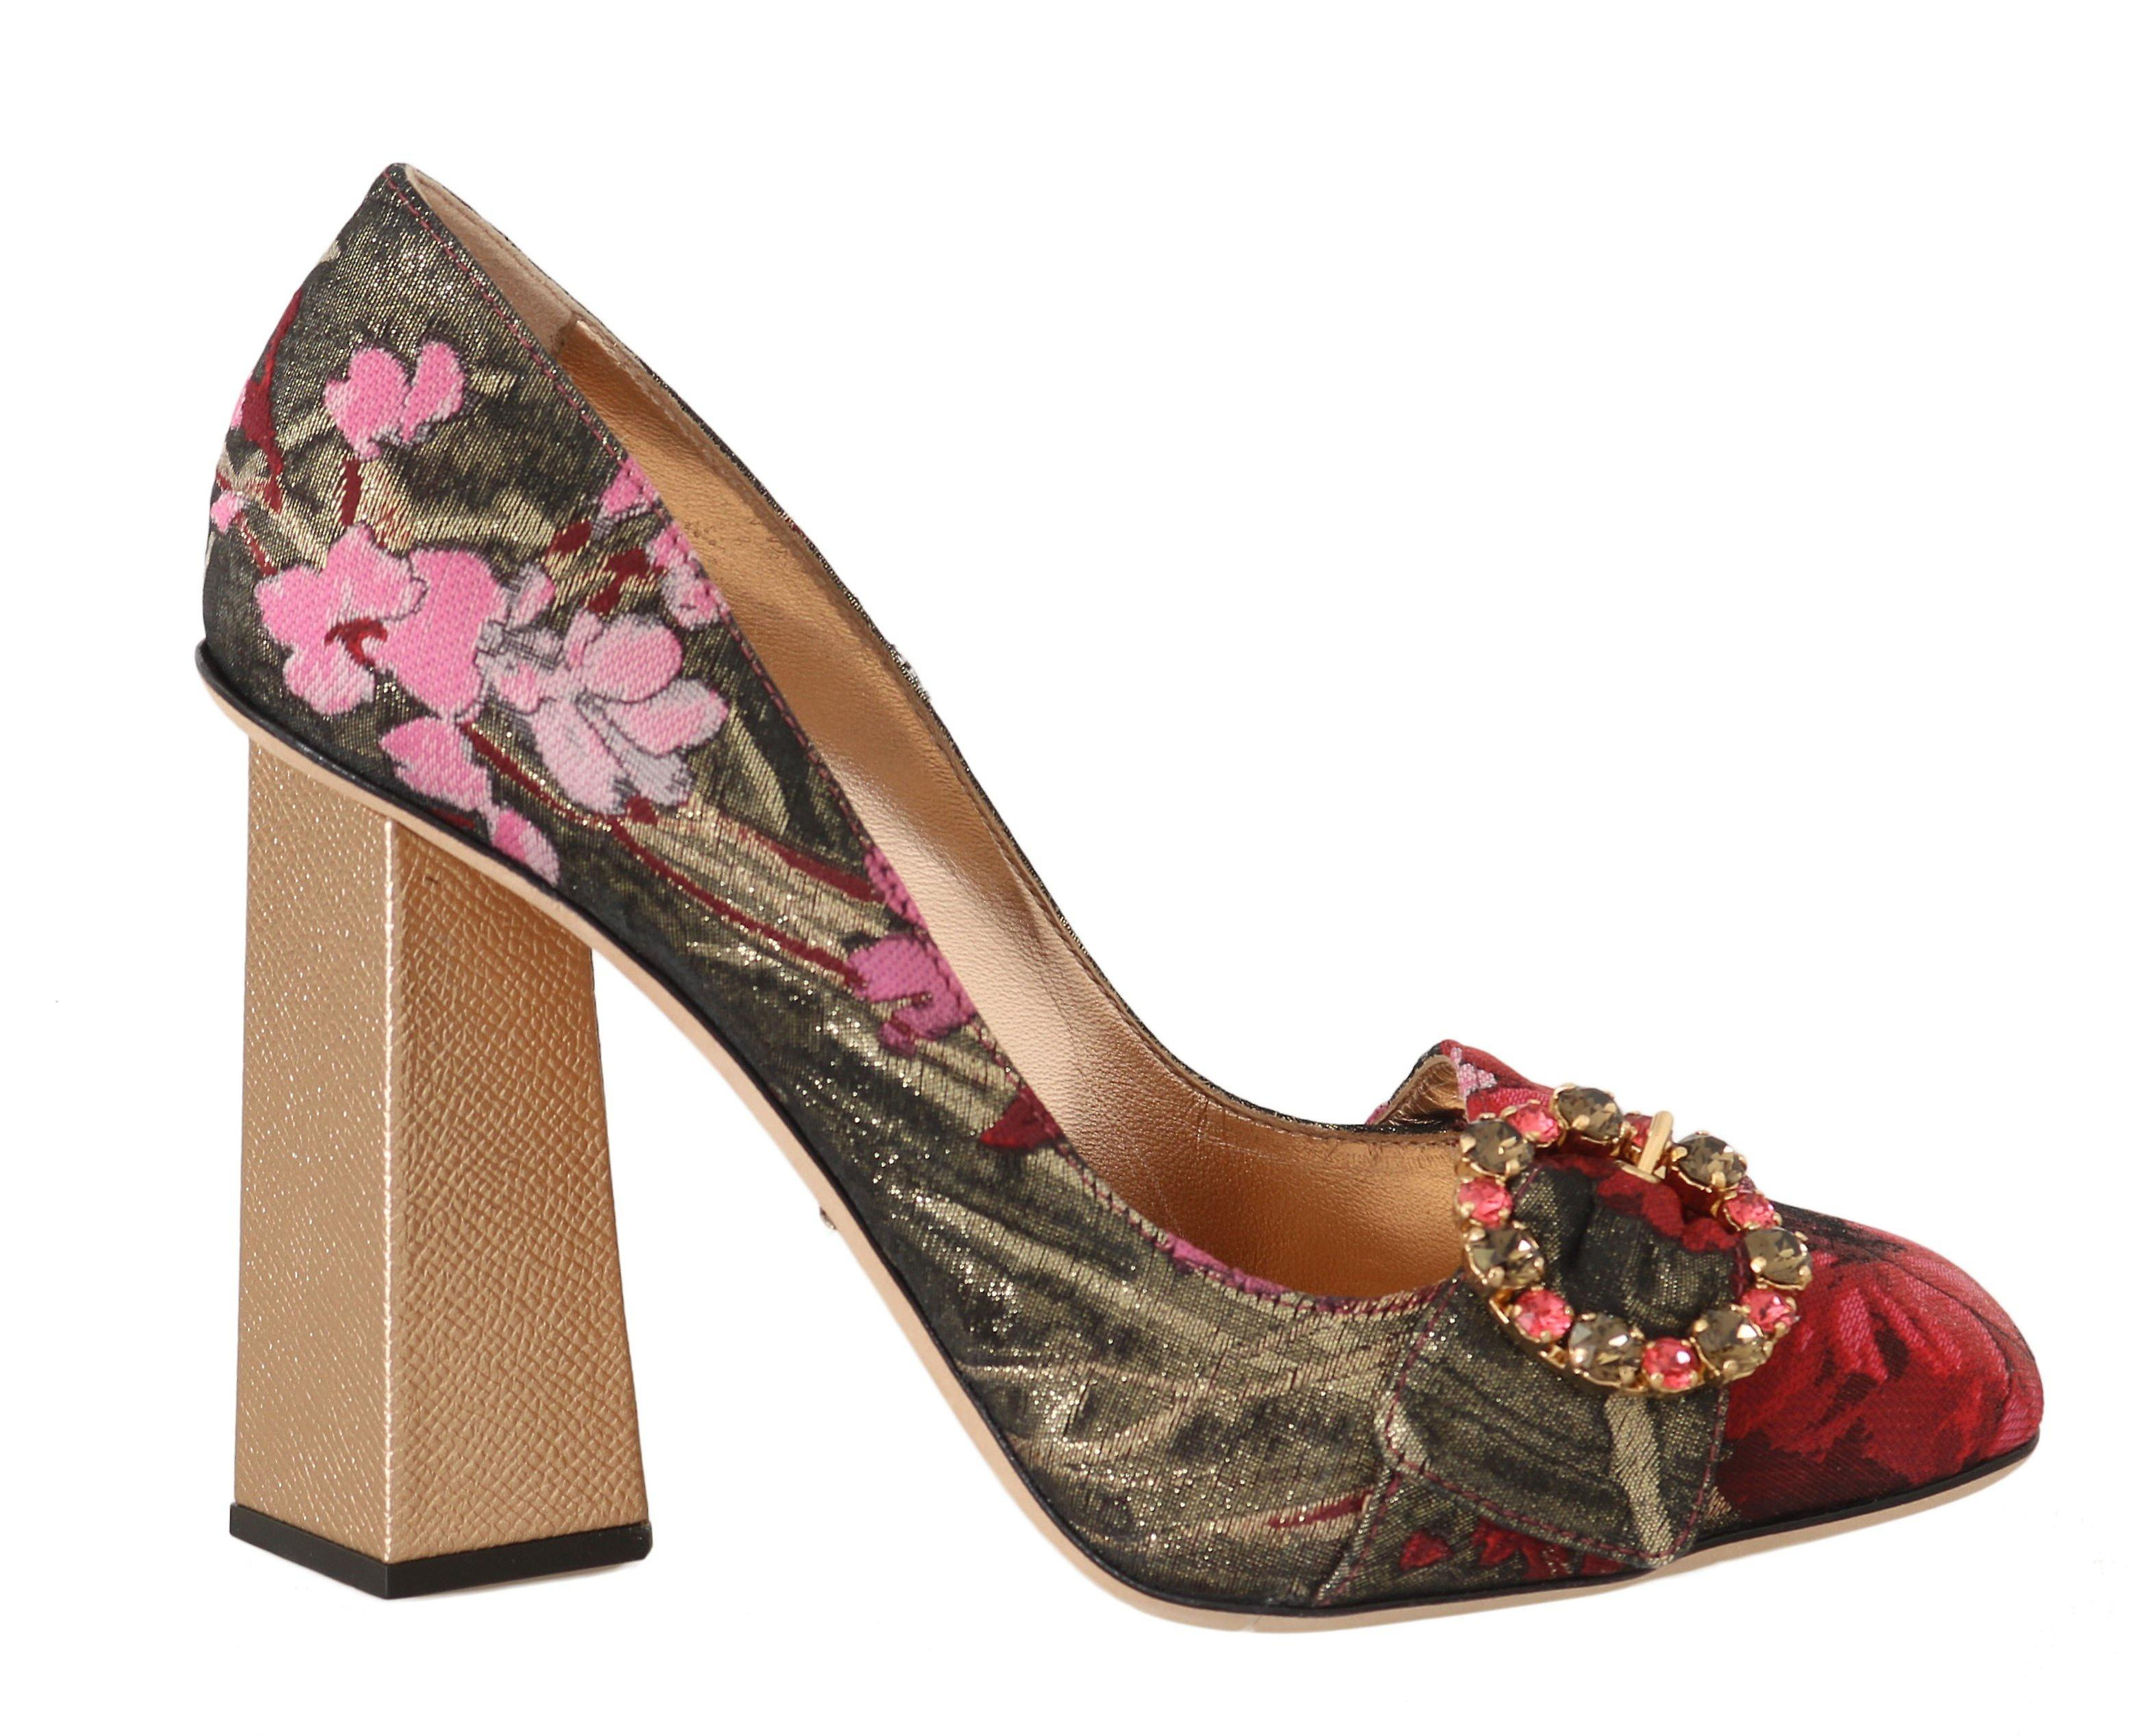 Dolce & Gabbana Red Jacquard Floral Crystal Pumps -- LA53299632 if4Ew